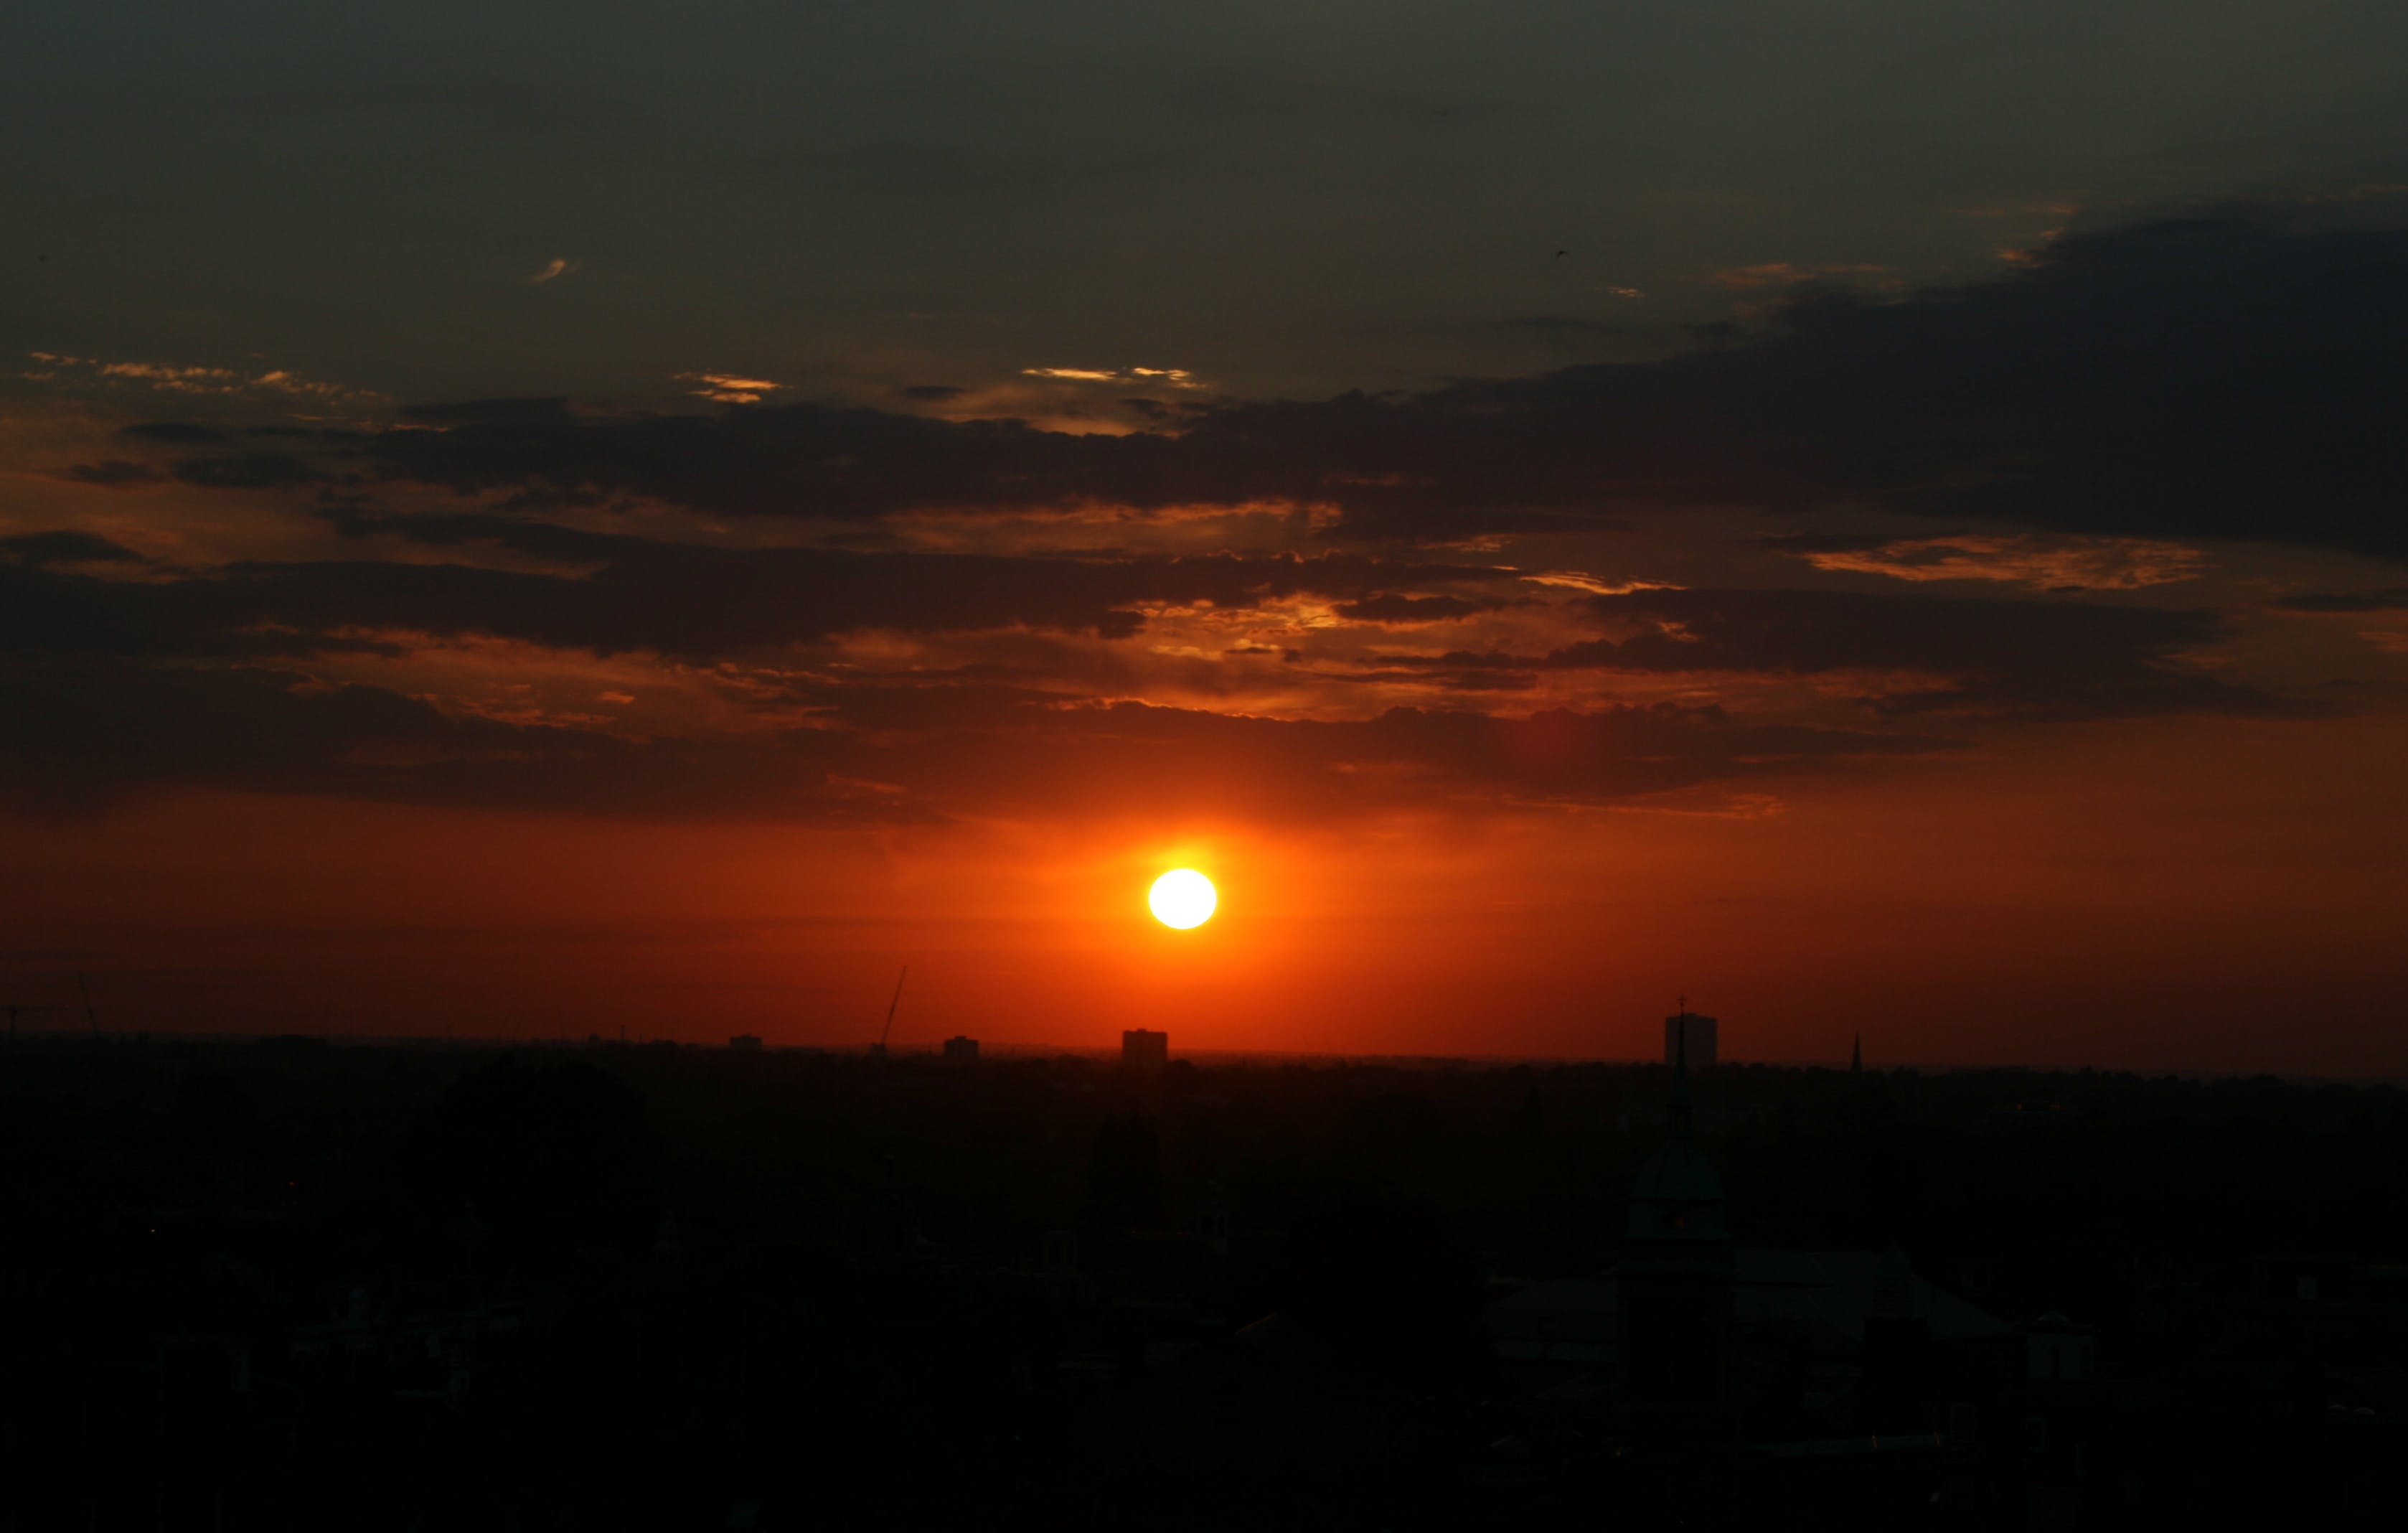 Free stock photo of city sunset, evening sun, golden sunset, sunset